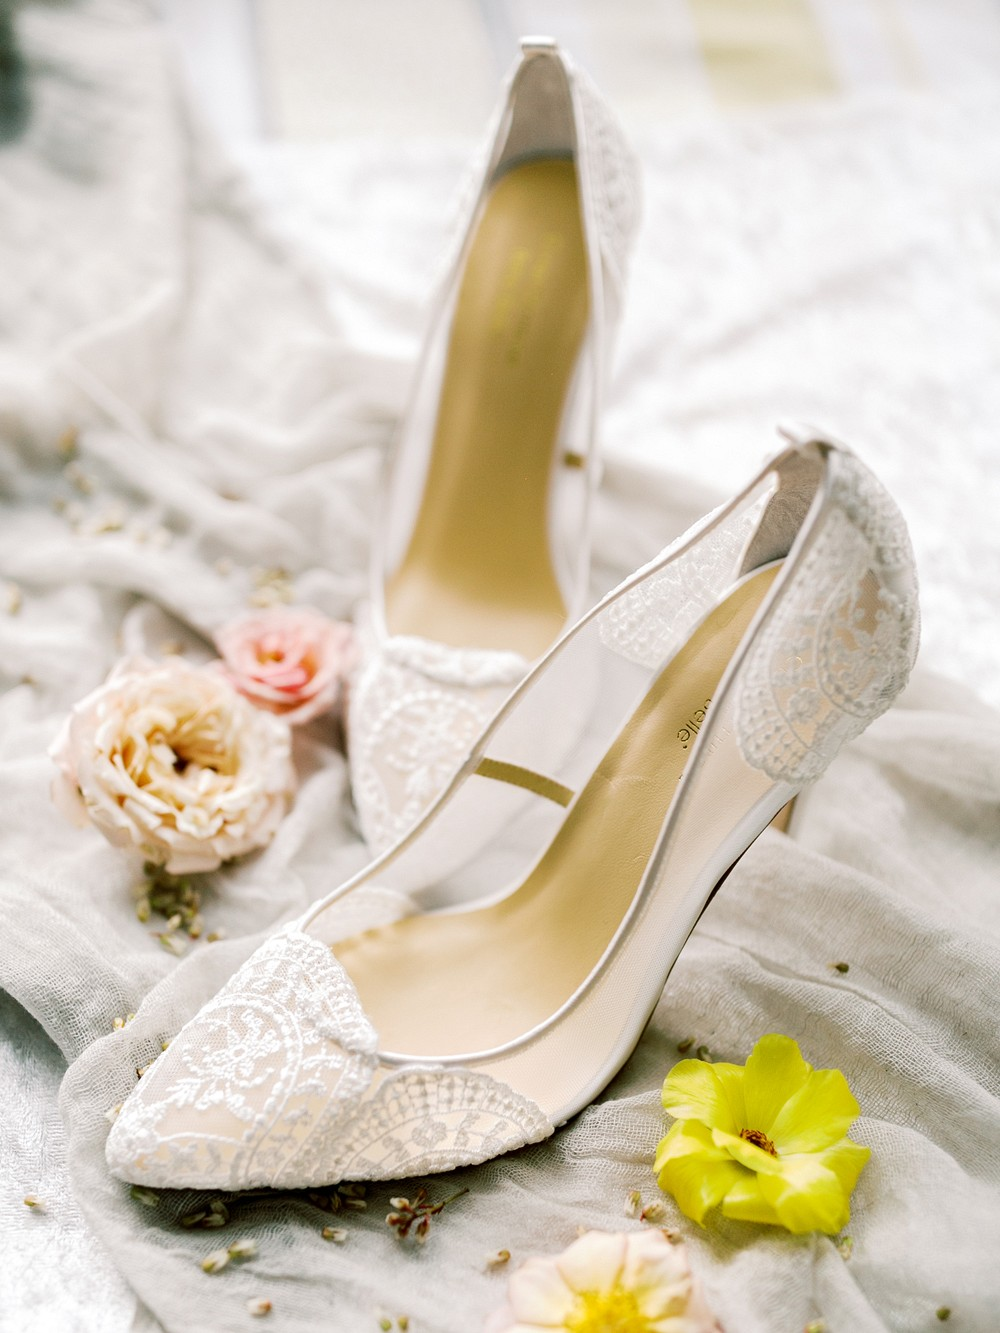 Regal Irish Wedding Style with Pops of Yellow